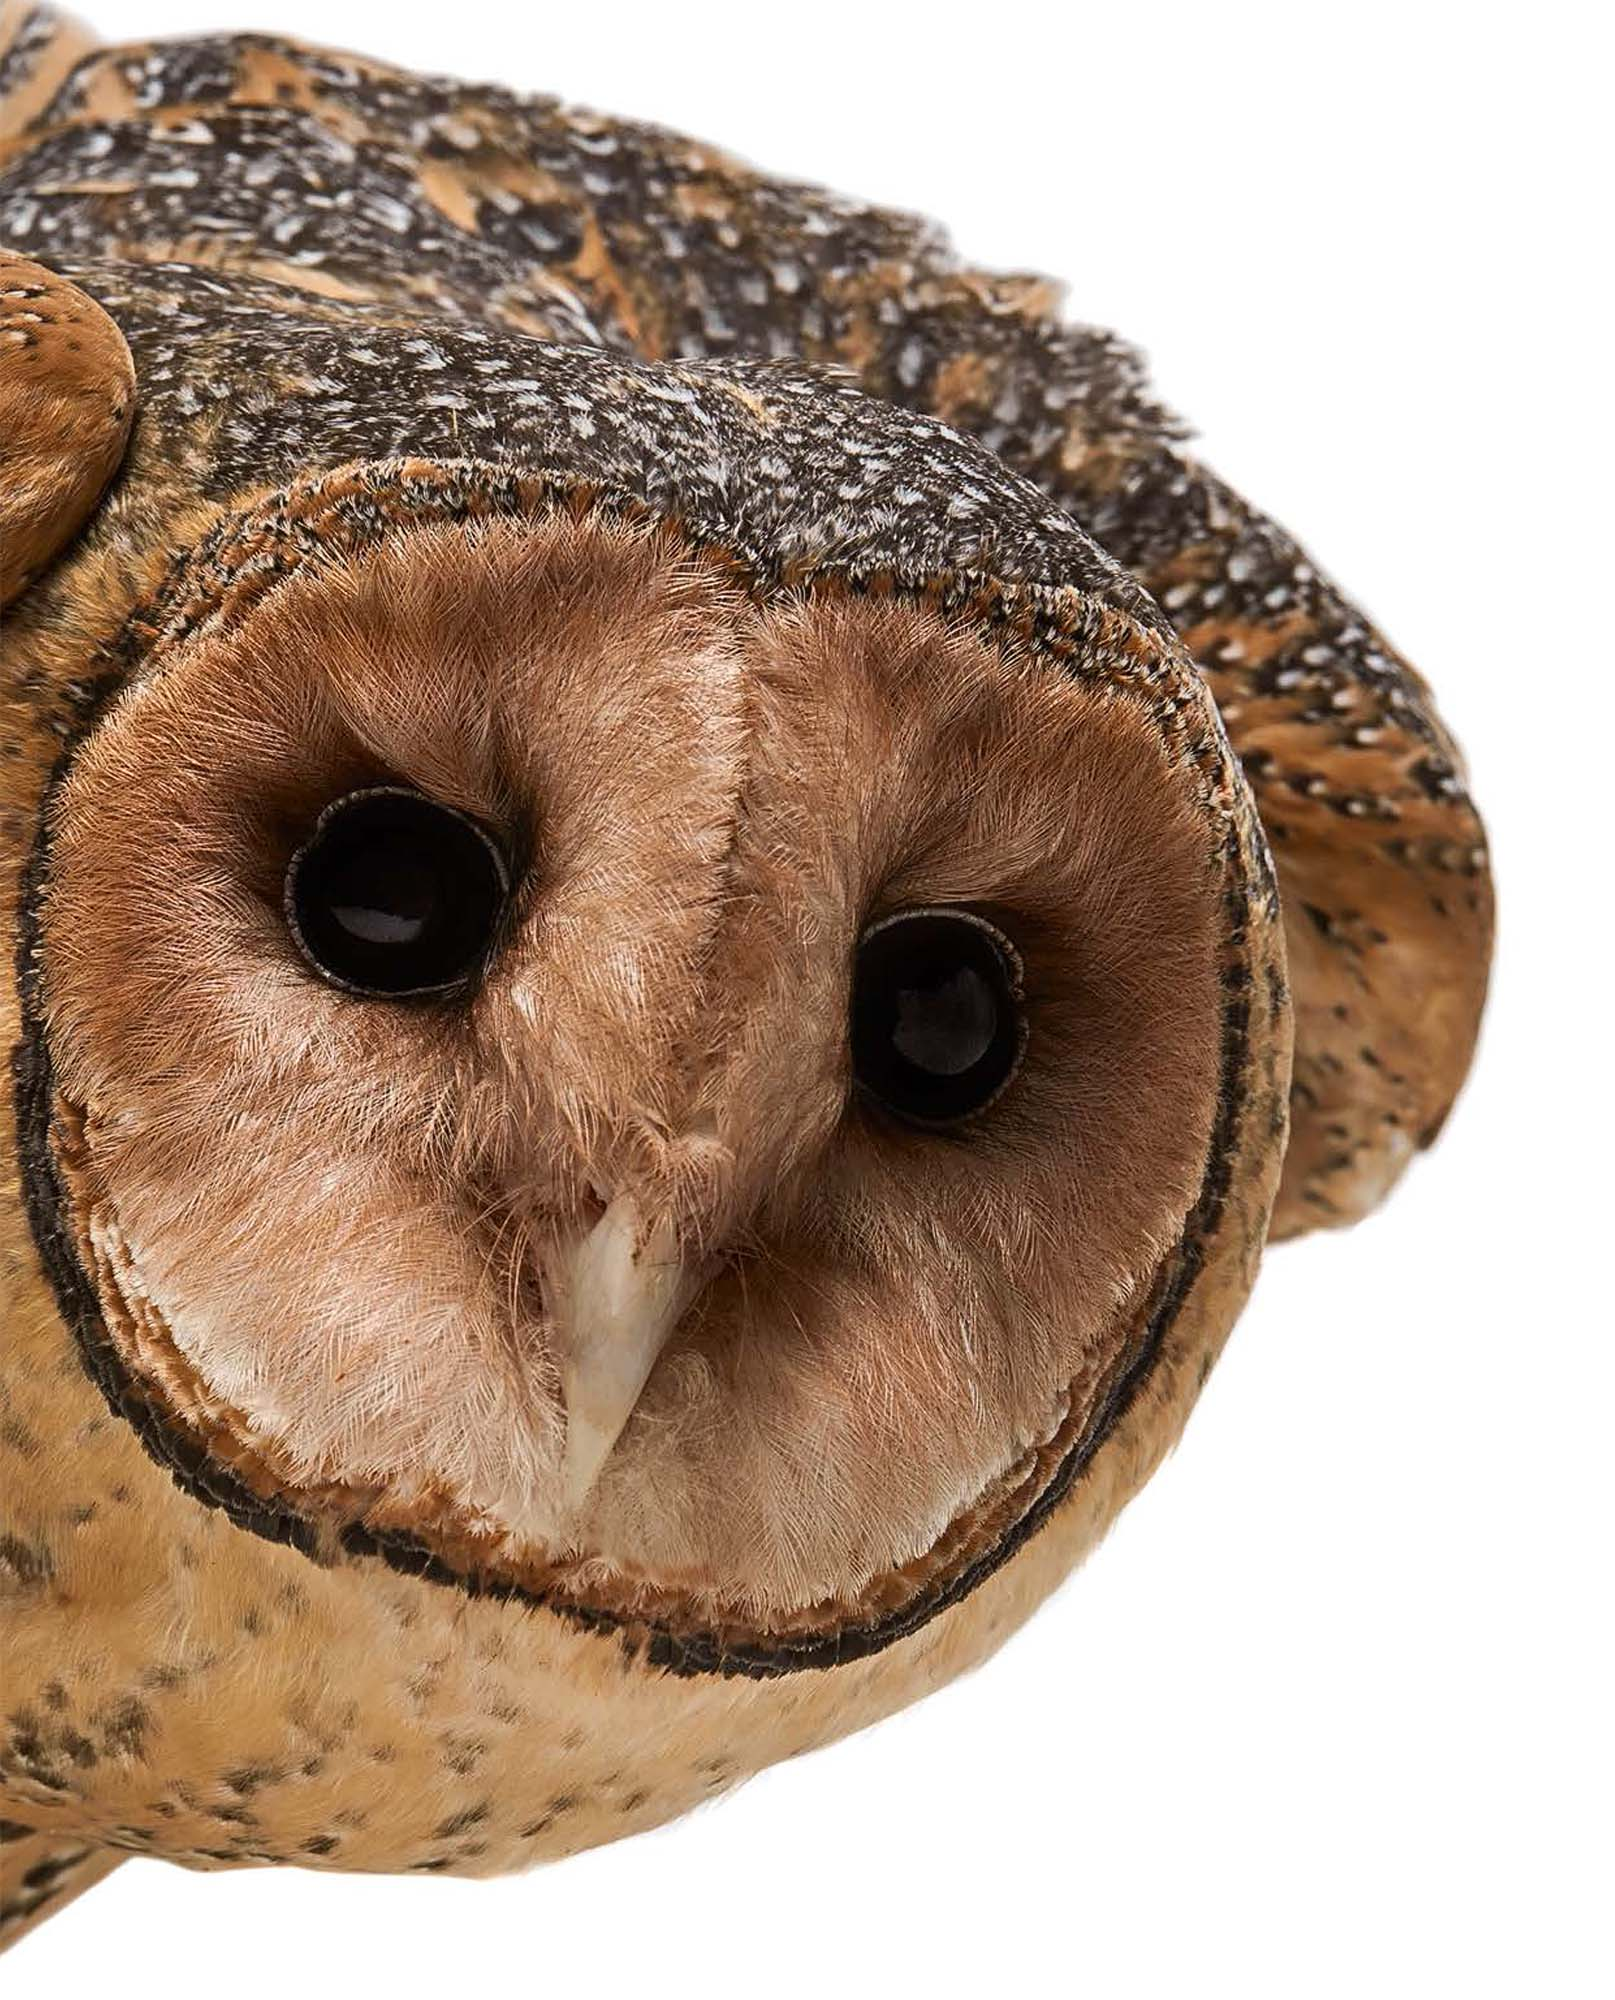 BIRD Gary Heery Book-completemmockup-22.jpg